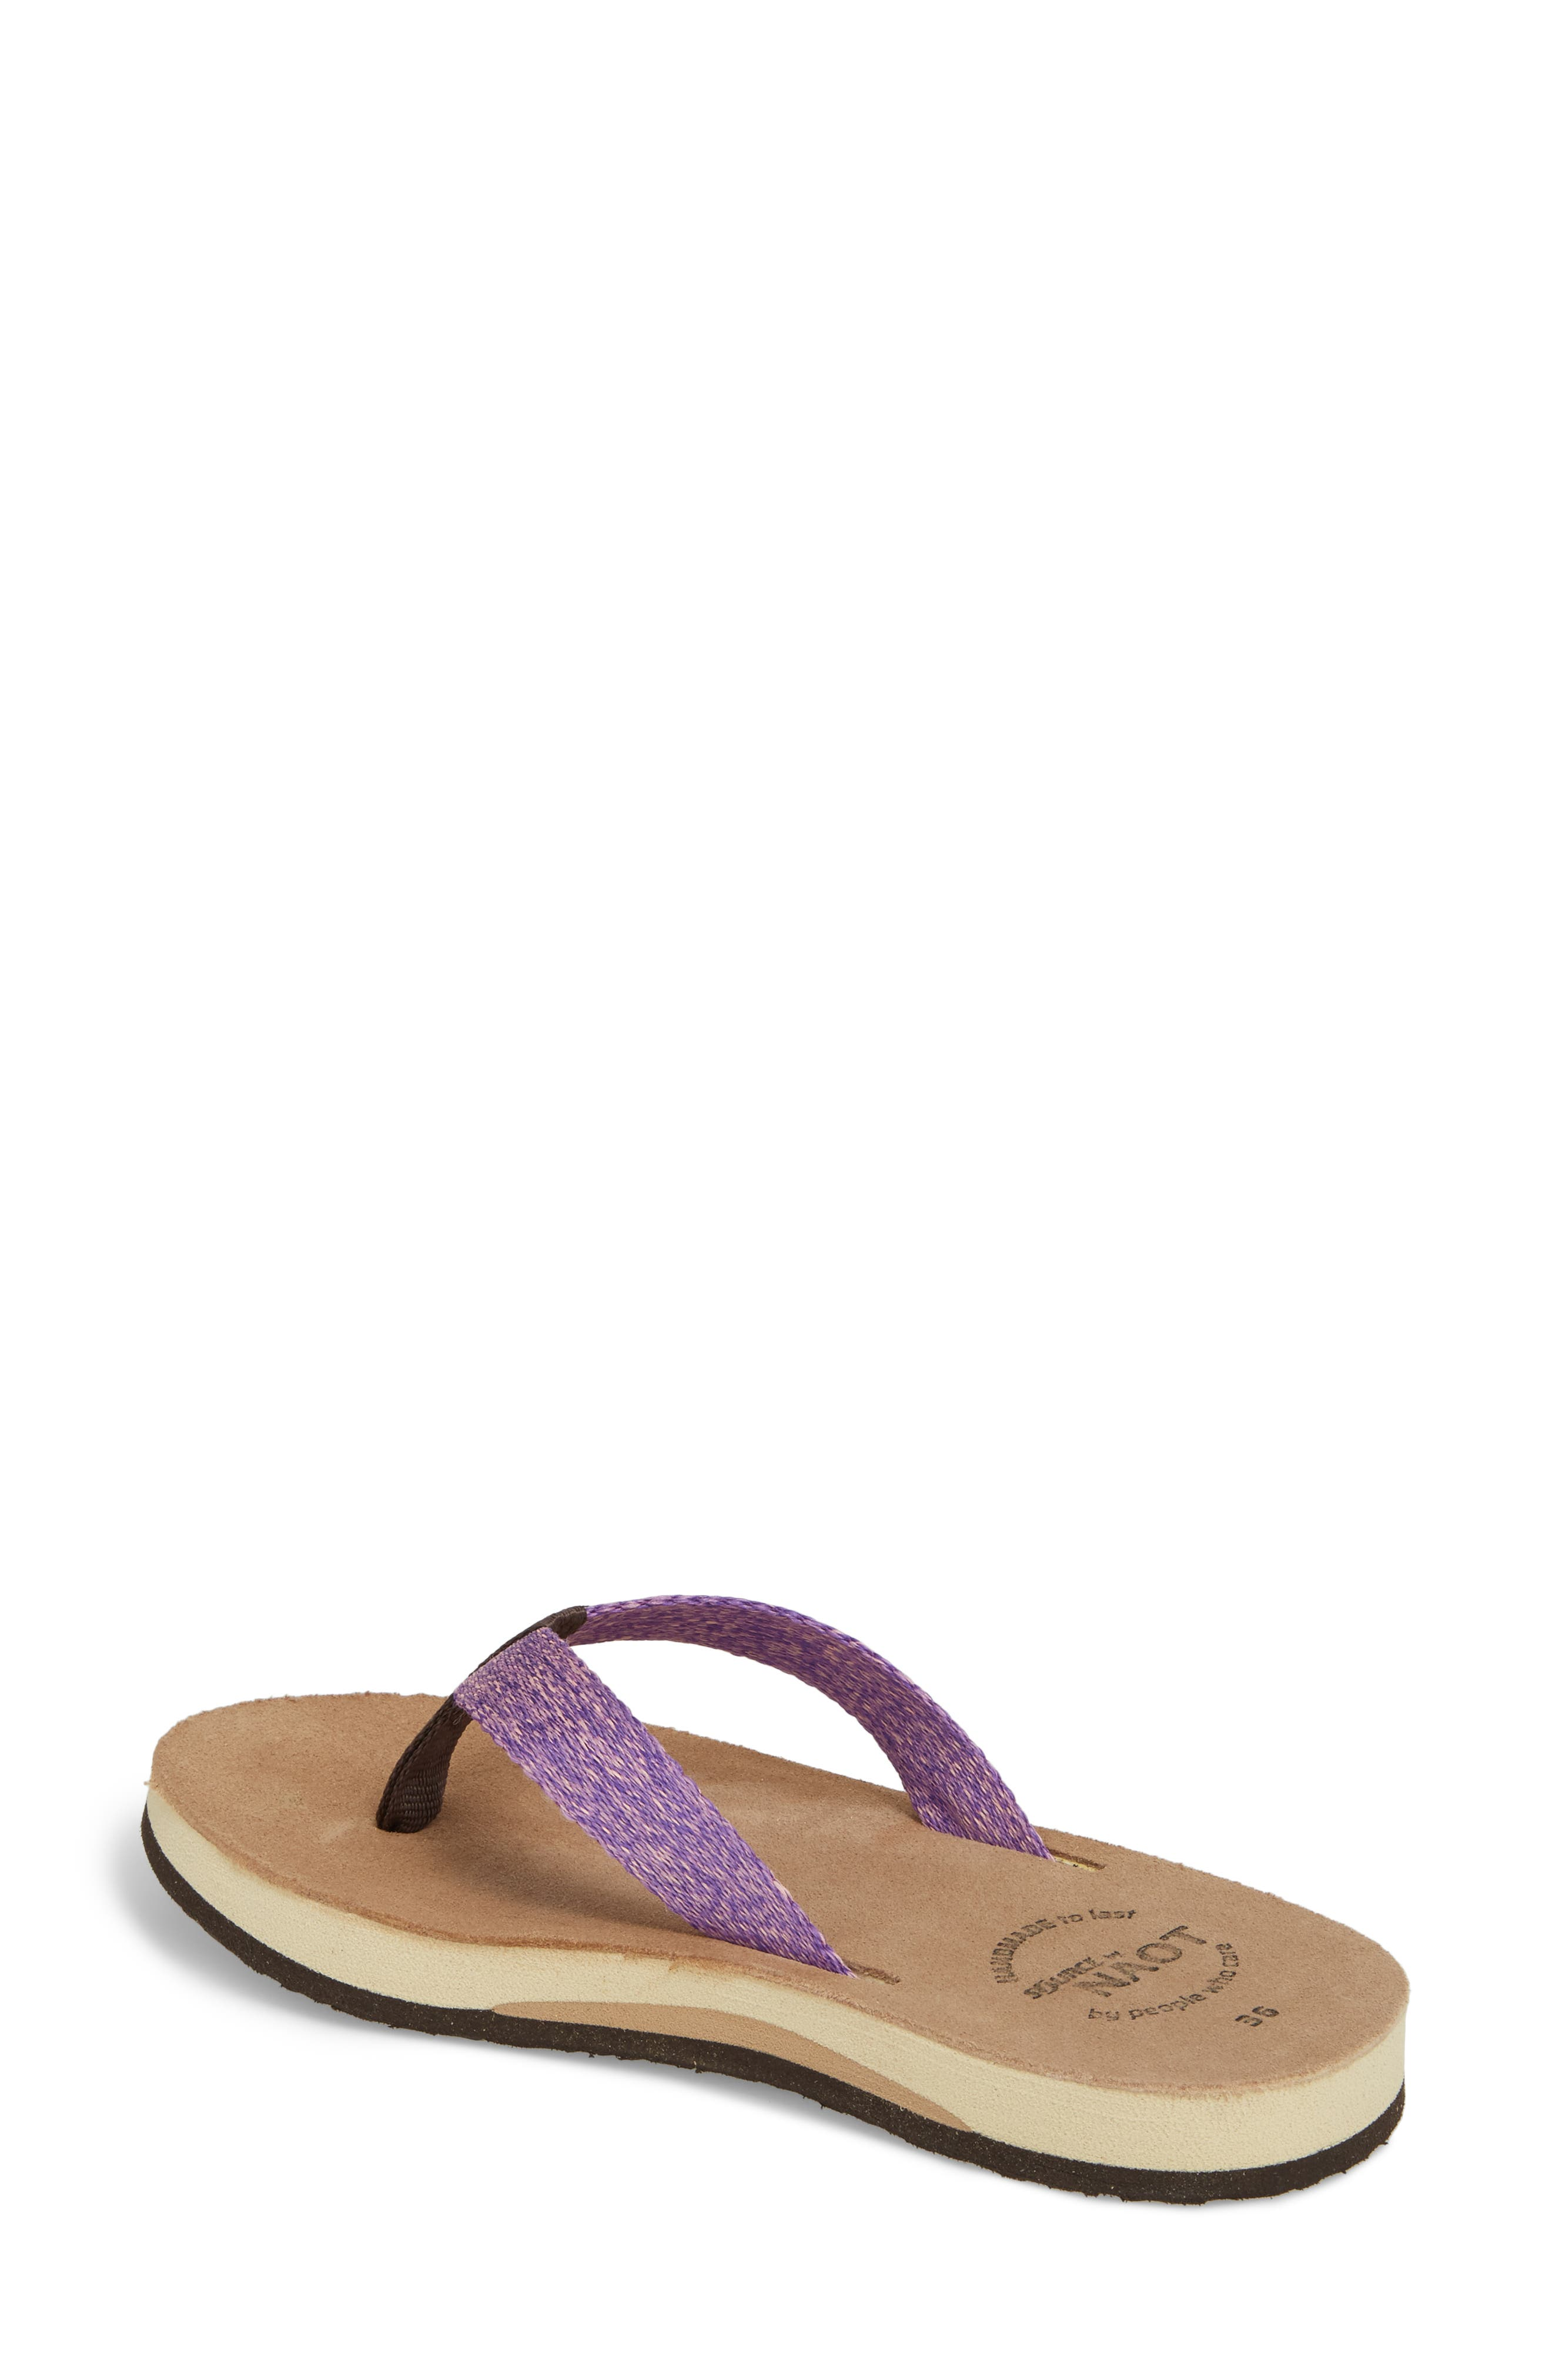 Island Flip Flop,                             Alternate thumbnail 2, color,                             Purple Lilac Fabric